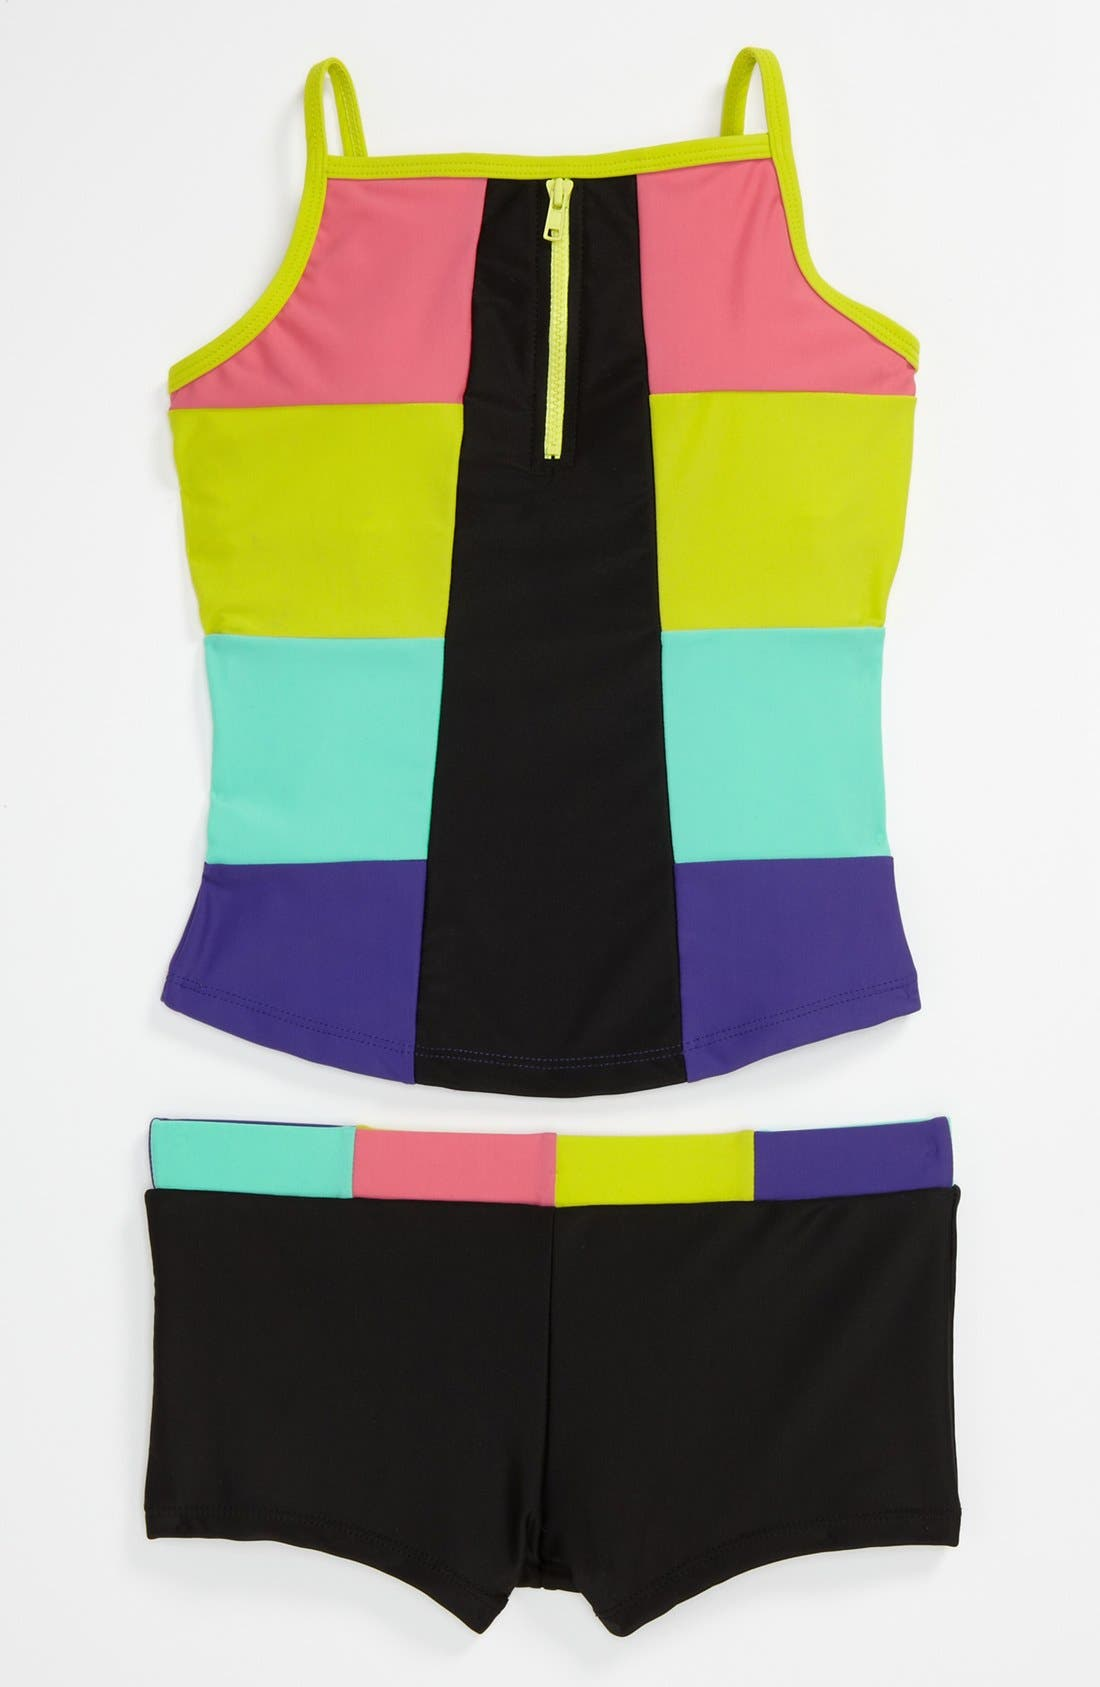 Alternate Image 1 Selected - Limeapple Two Piece Tankini Swimsuit (Little Girls & Big Girls)